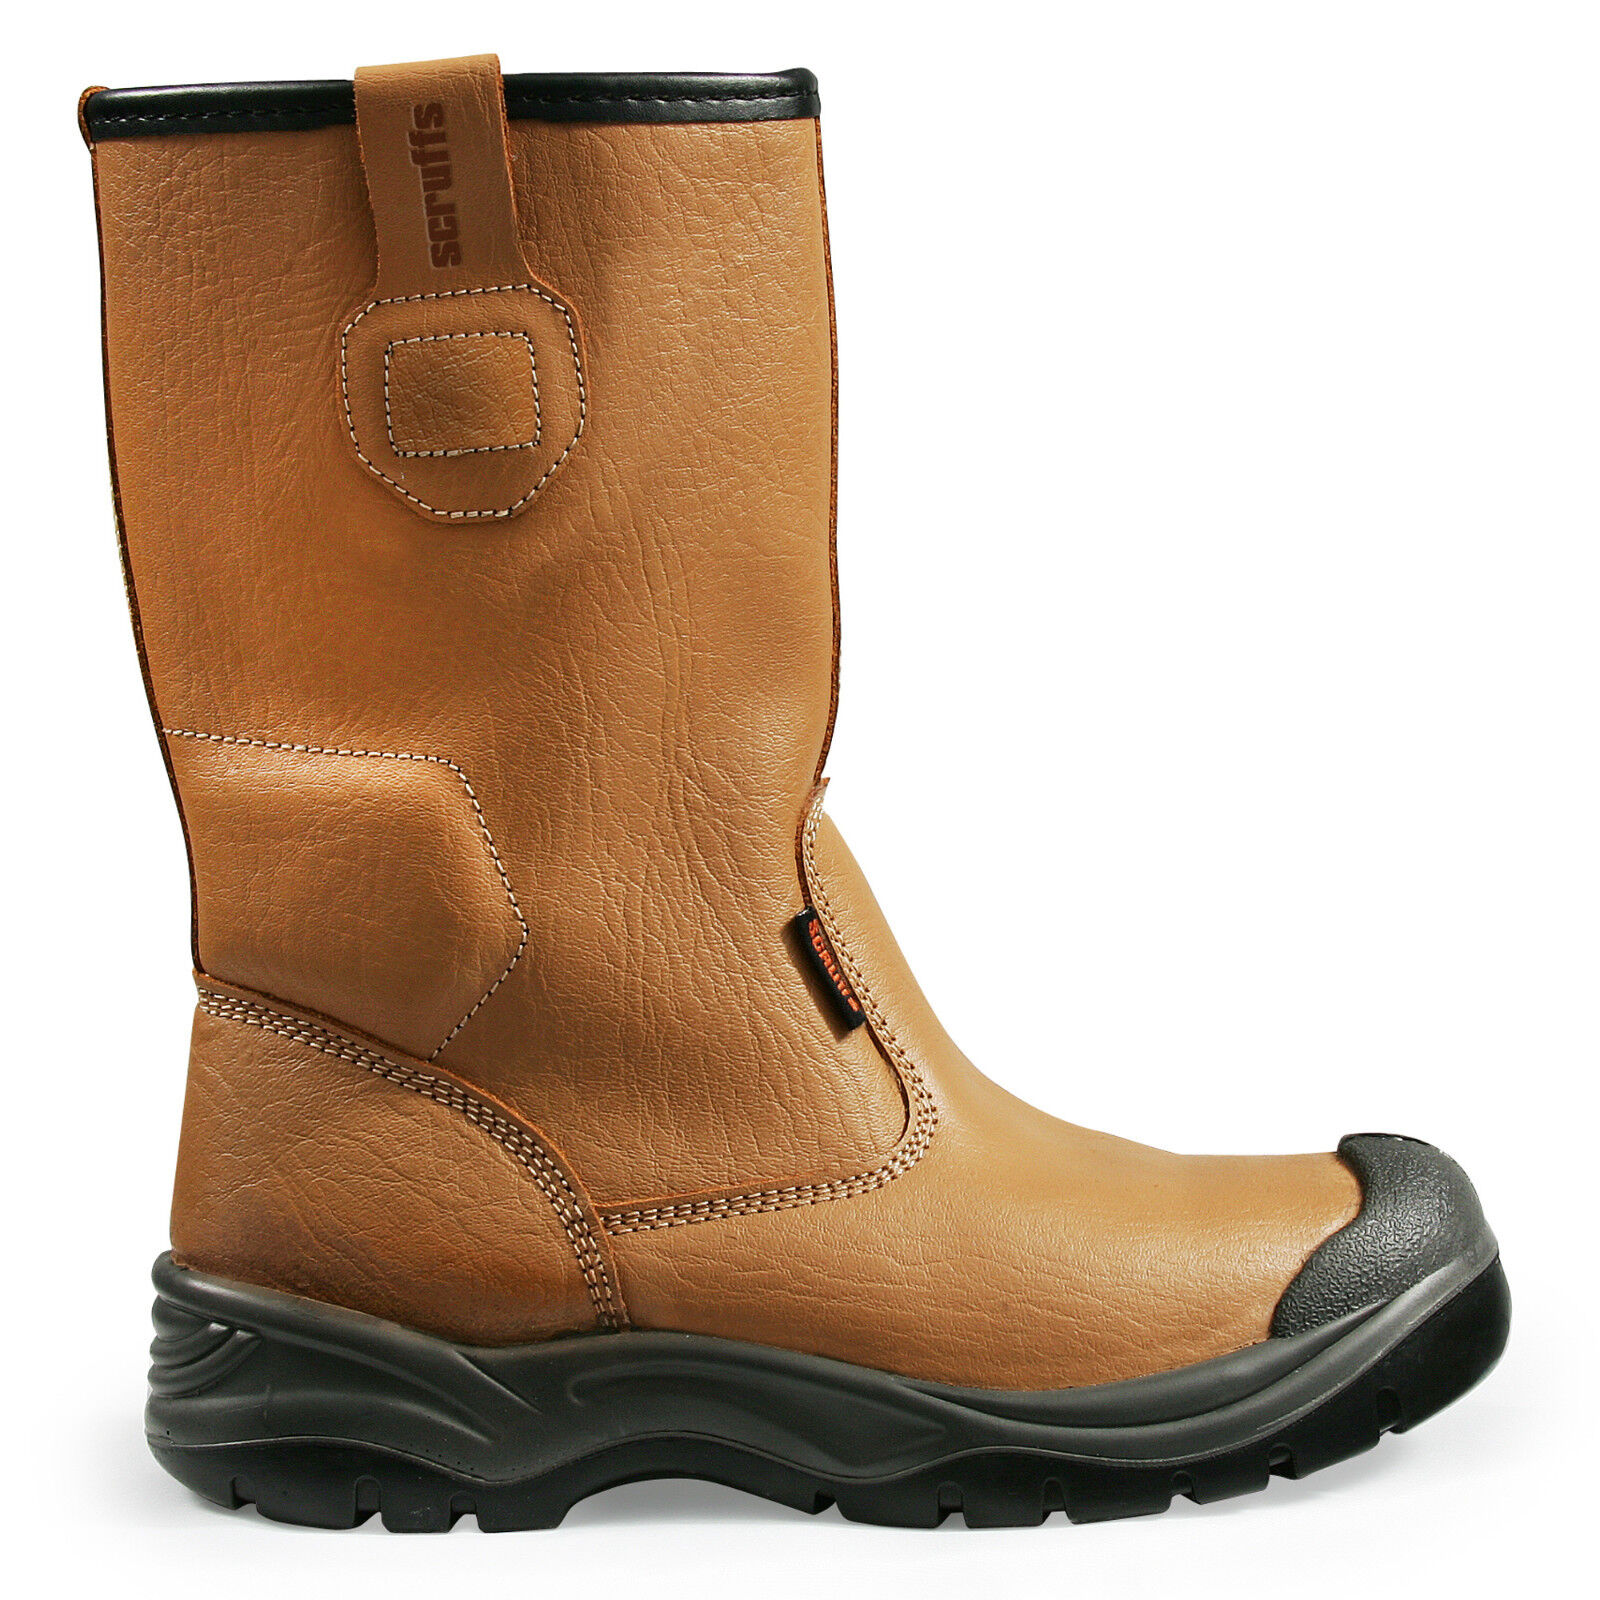 Scruffs Gravity Rigger Stiefel Tan/Braun Steel Toe Cap Stiefel Safety Stiefel Cap Größes 7-12 30de32